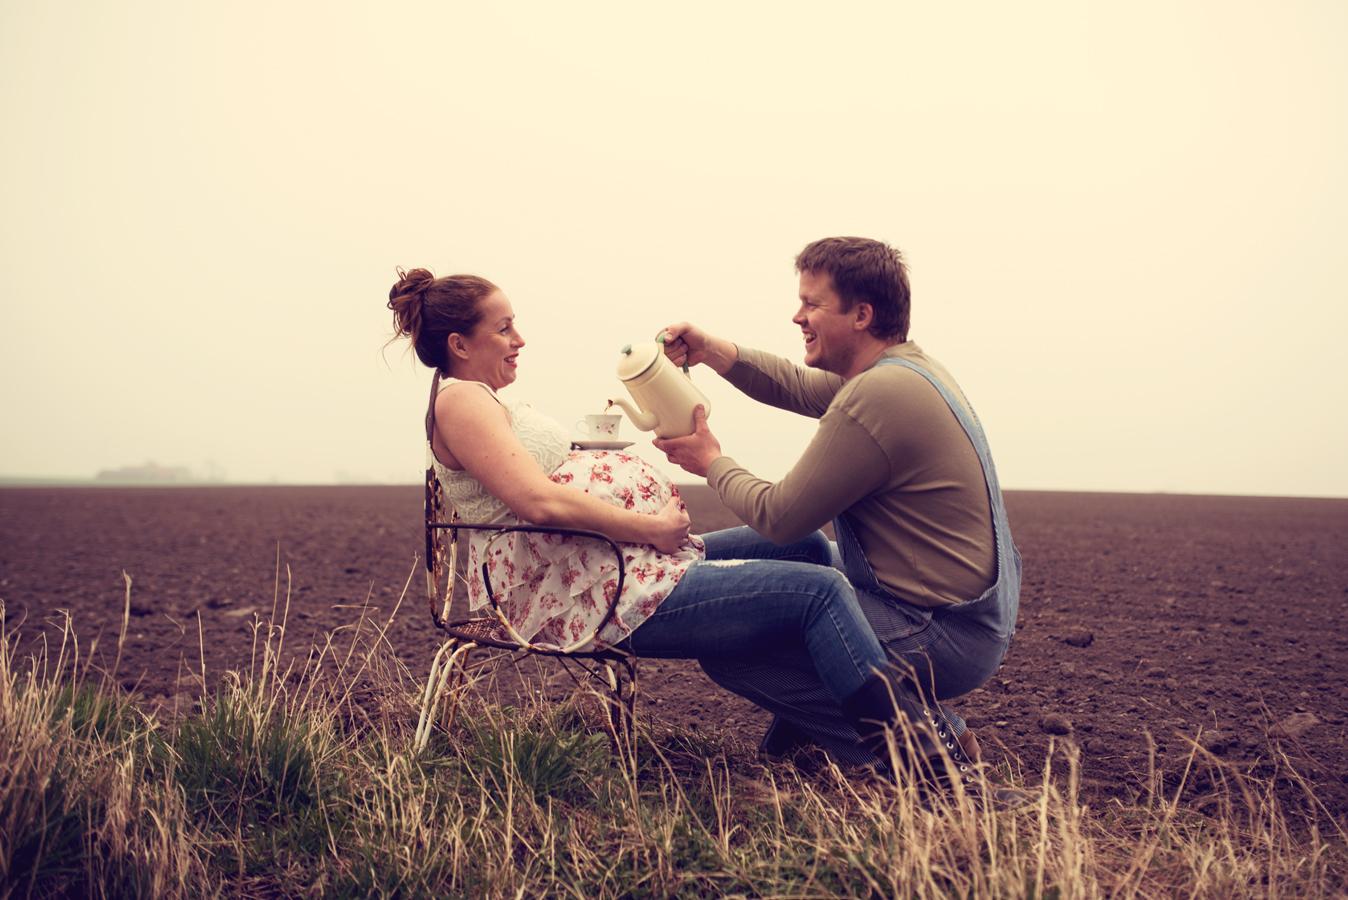 bröllopsfotograf,gravidfotografering,parfotografering,couplephotography,weddingphotographer,skåne,malmö